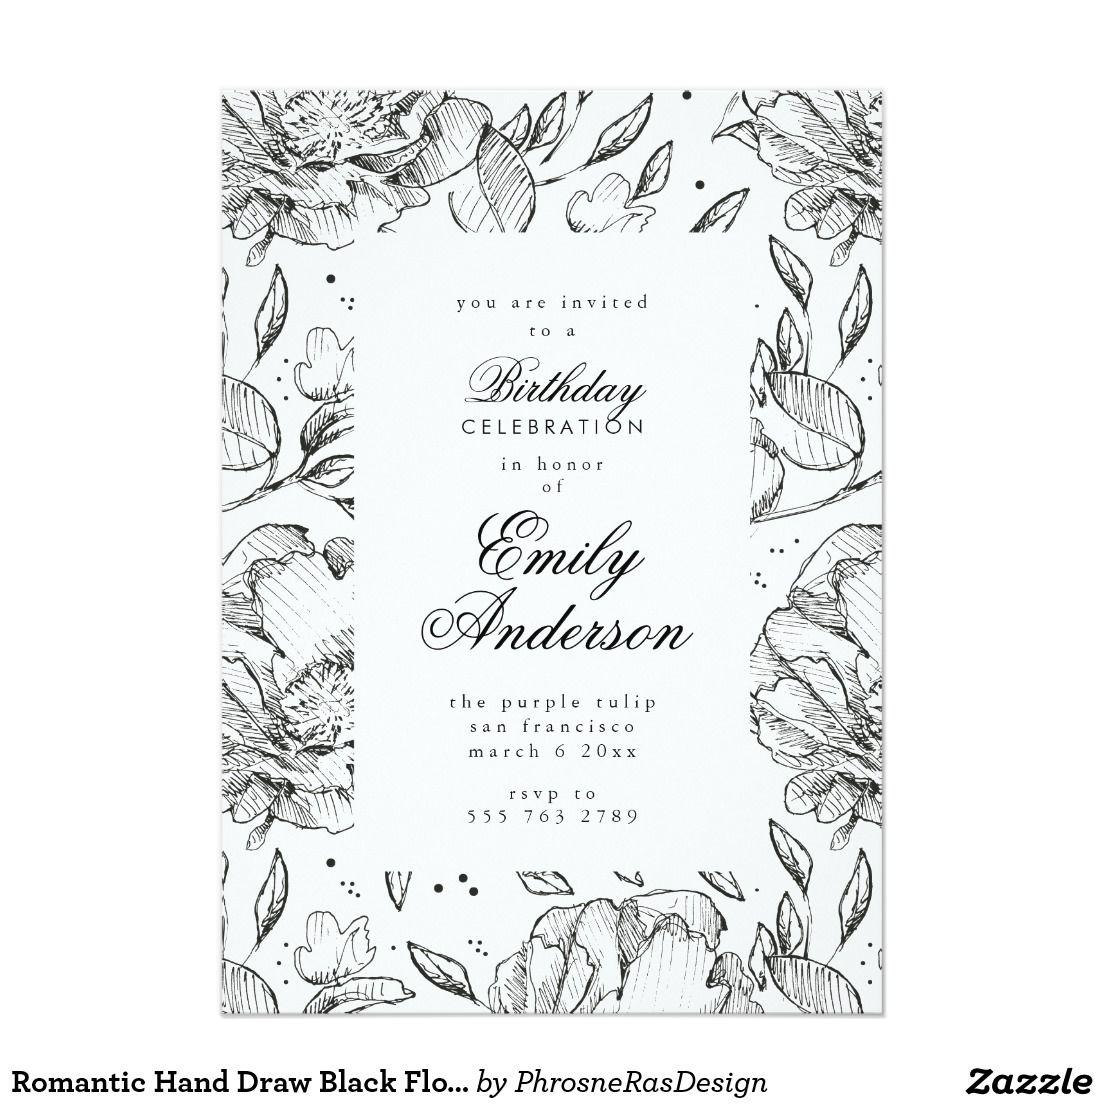 Romantic Hand Draw Black Floral Elegant Invitation #zazzle ...